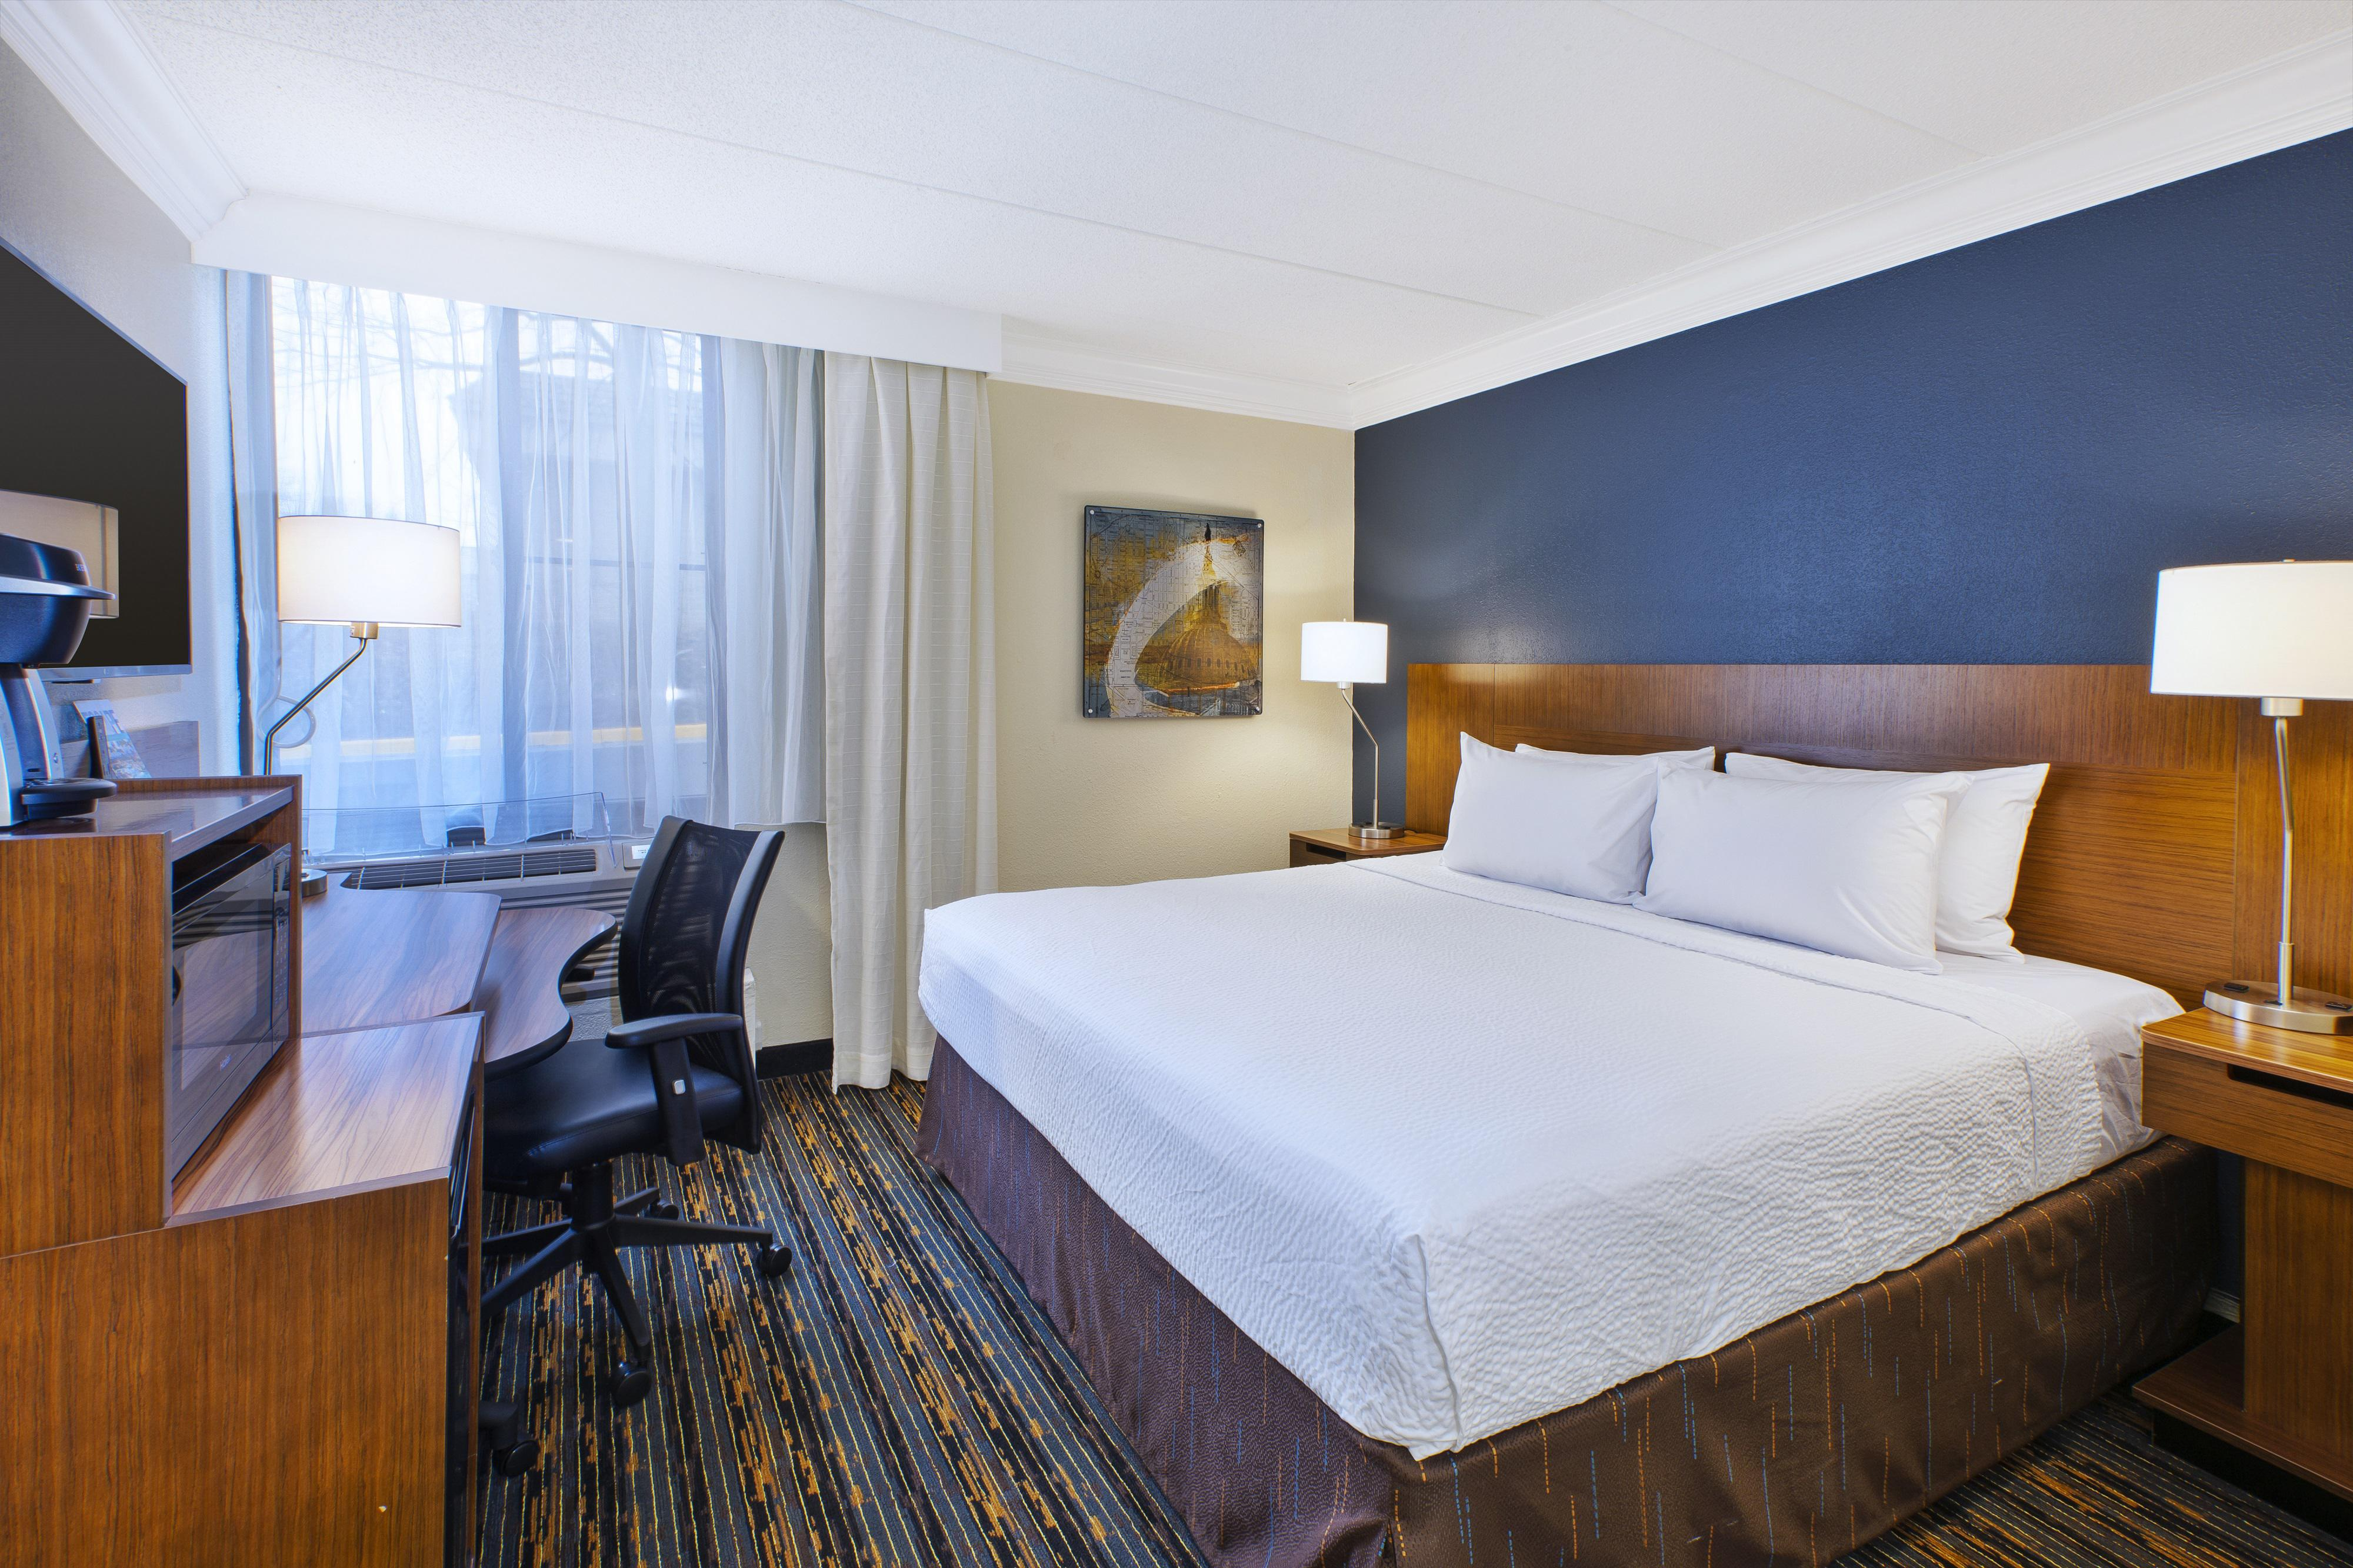 Fairfield Inn & Suites by Marriott Dulles Airport Herndon/Reston image 12